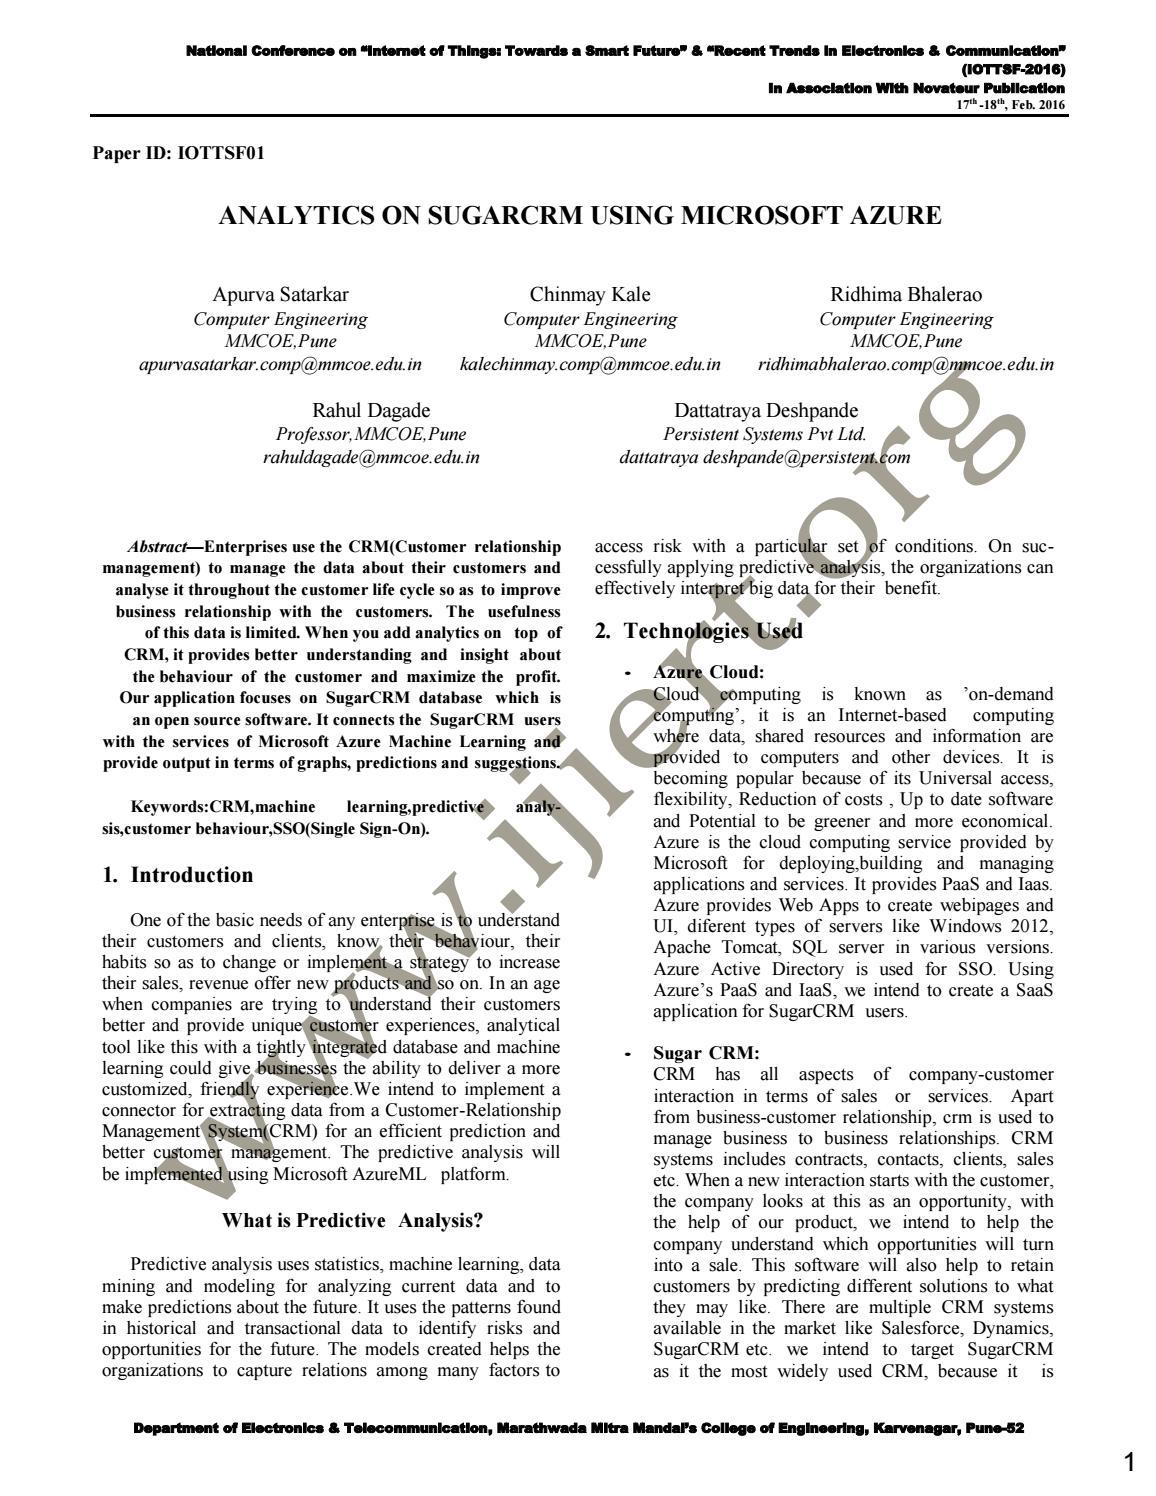 IJIERT-ANALYTICS ON SUGARCRM USING MICROSOFT AZURE by IJIERT